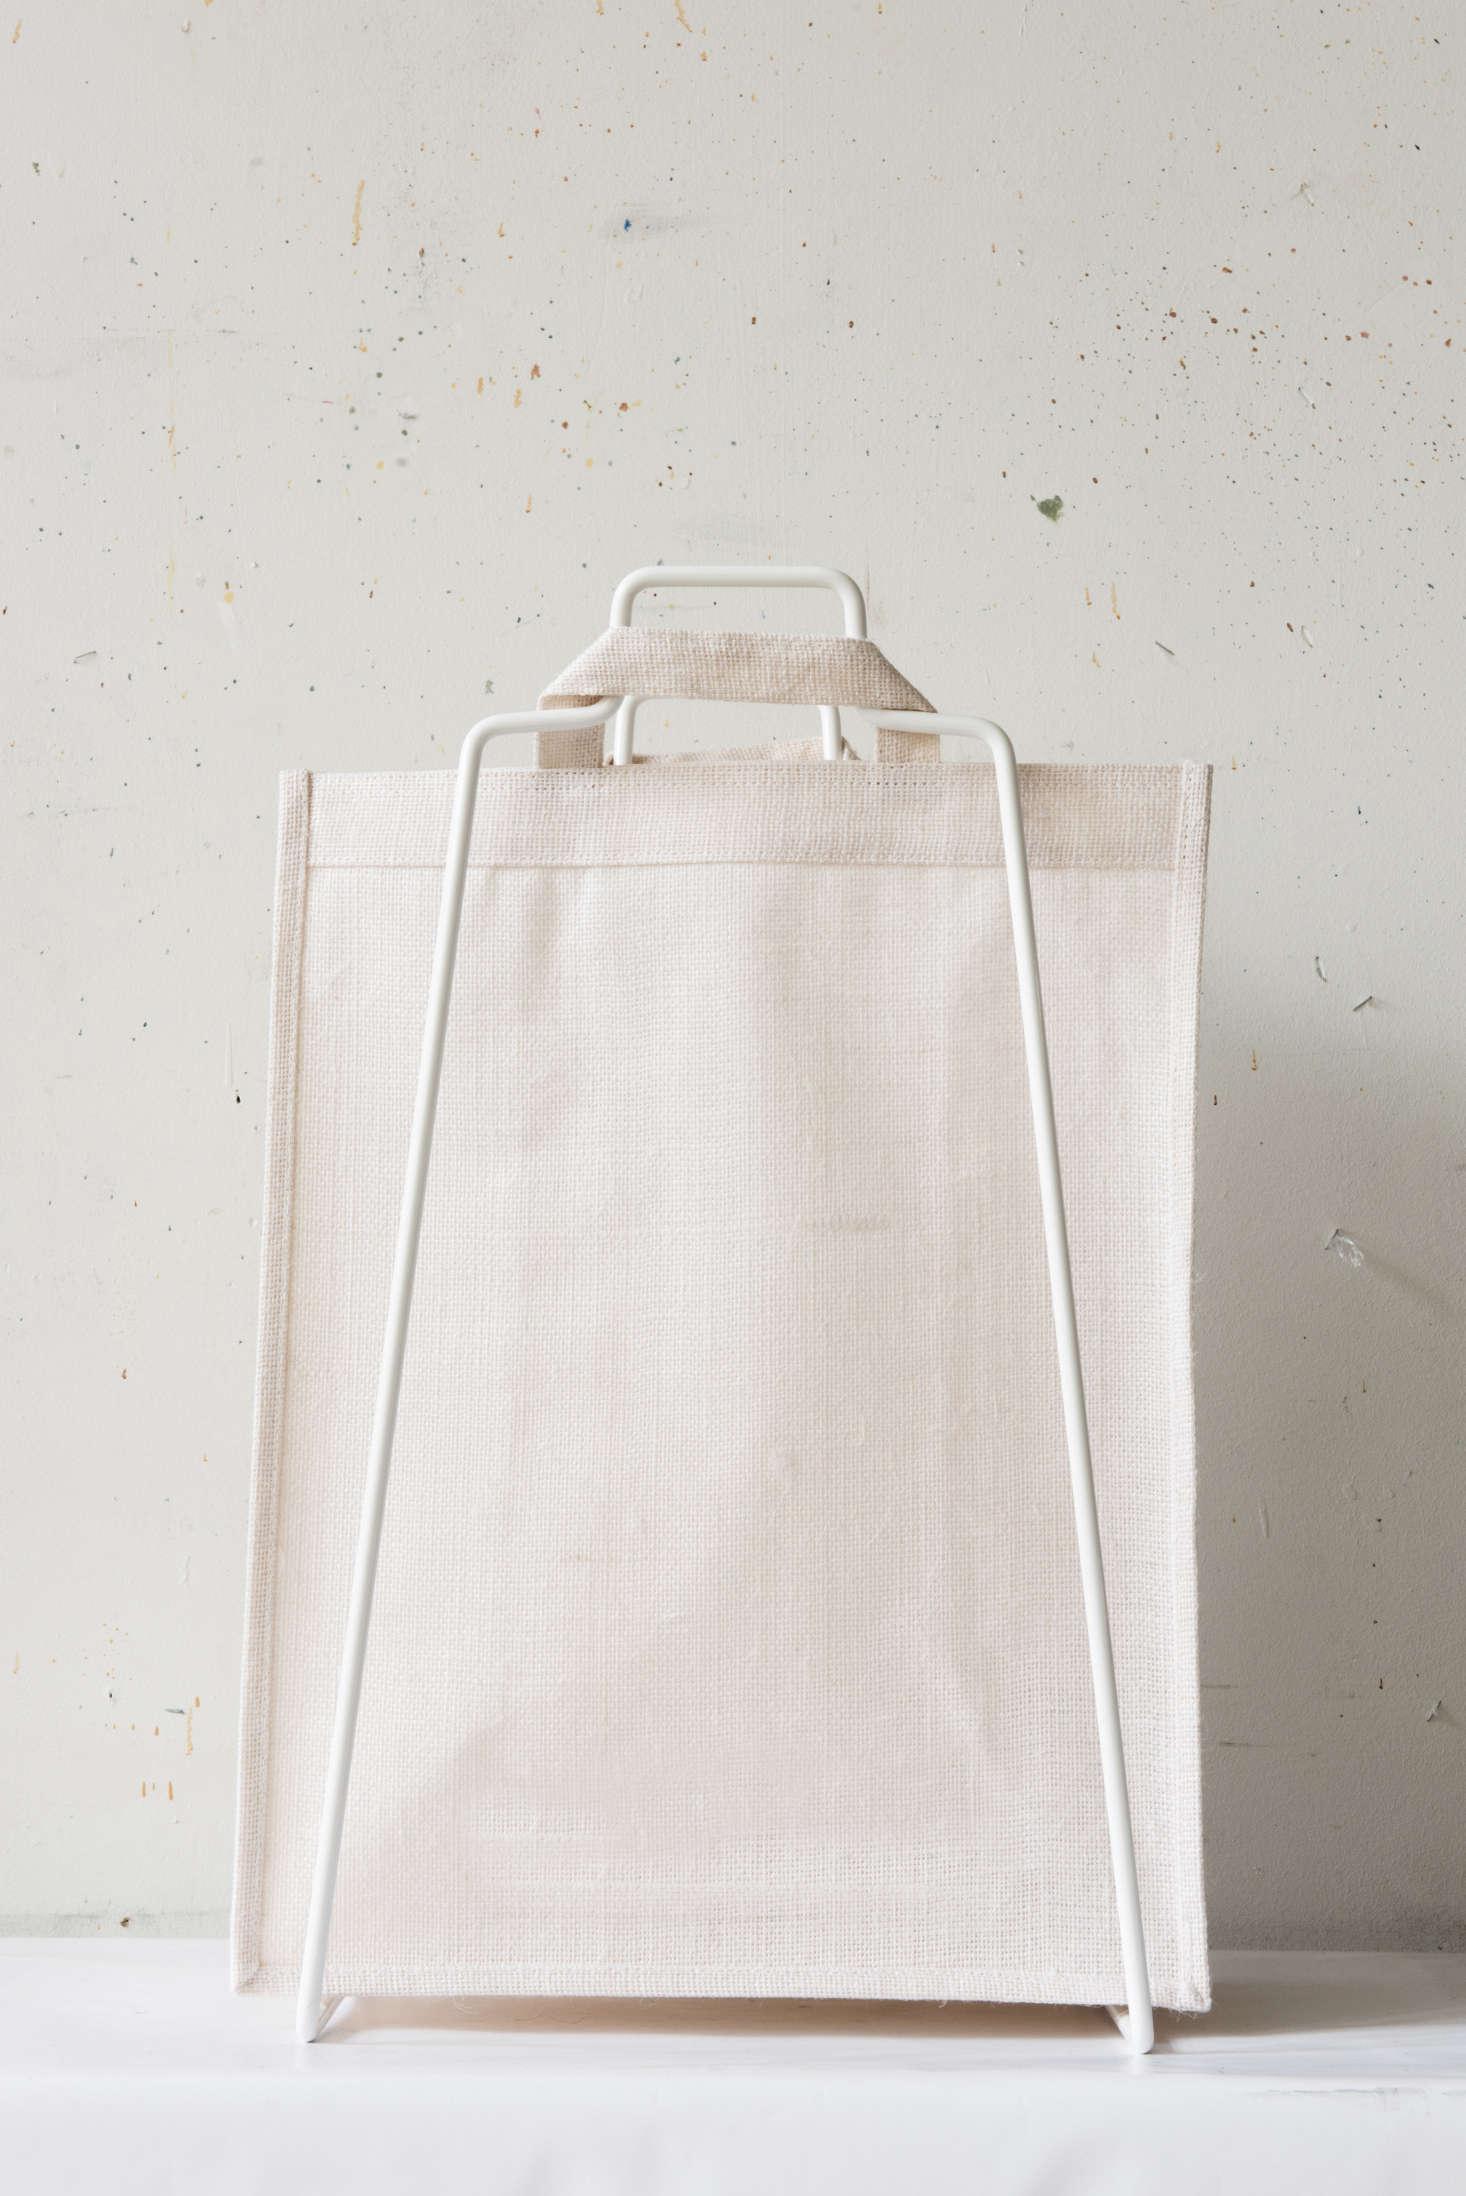 Everyday Design Finland Jute Bag Helsinki Bag Holder